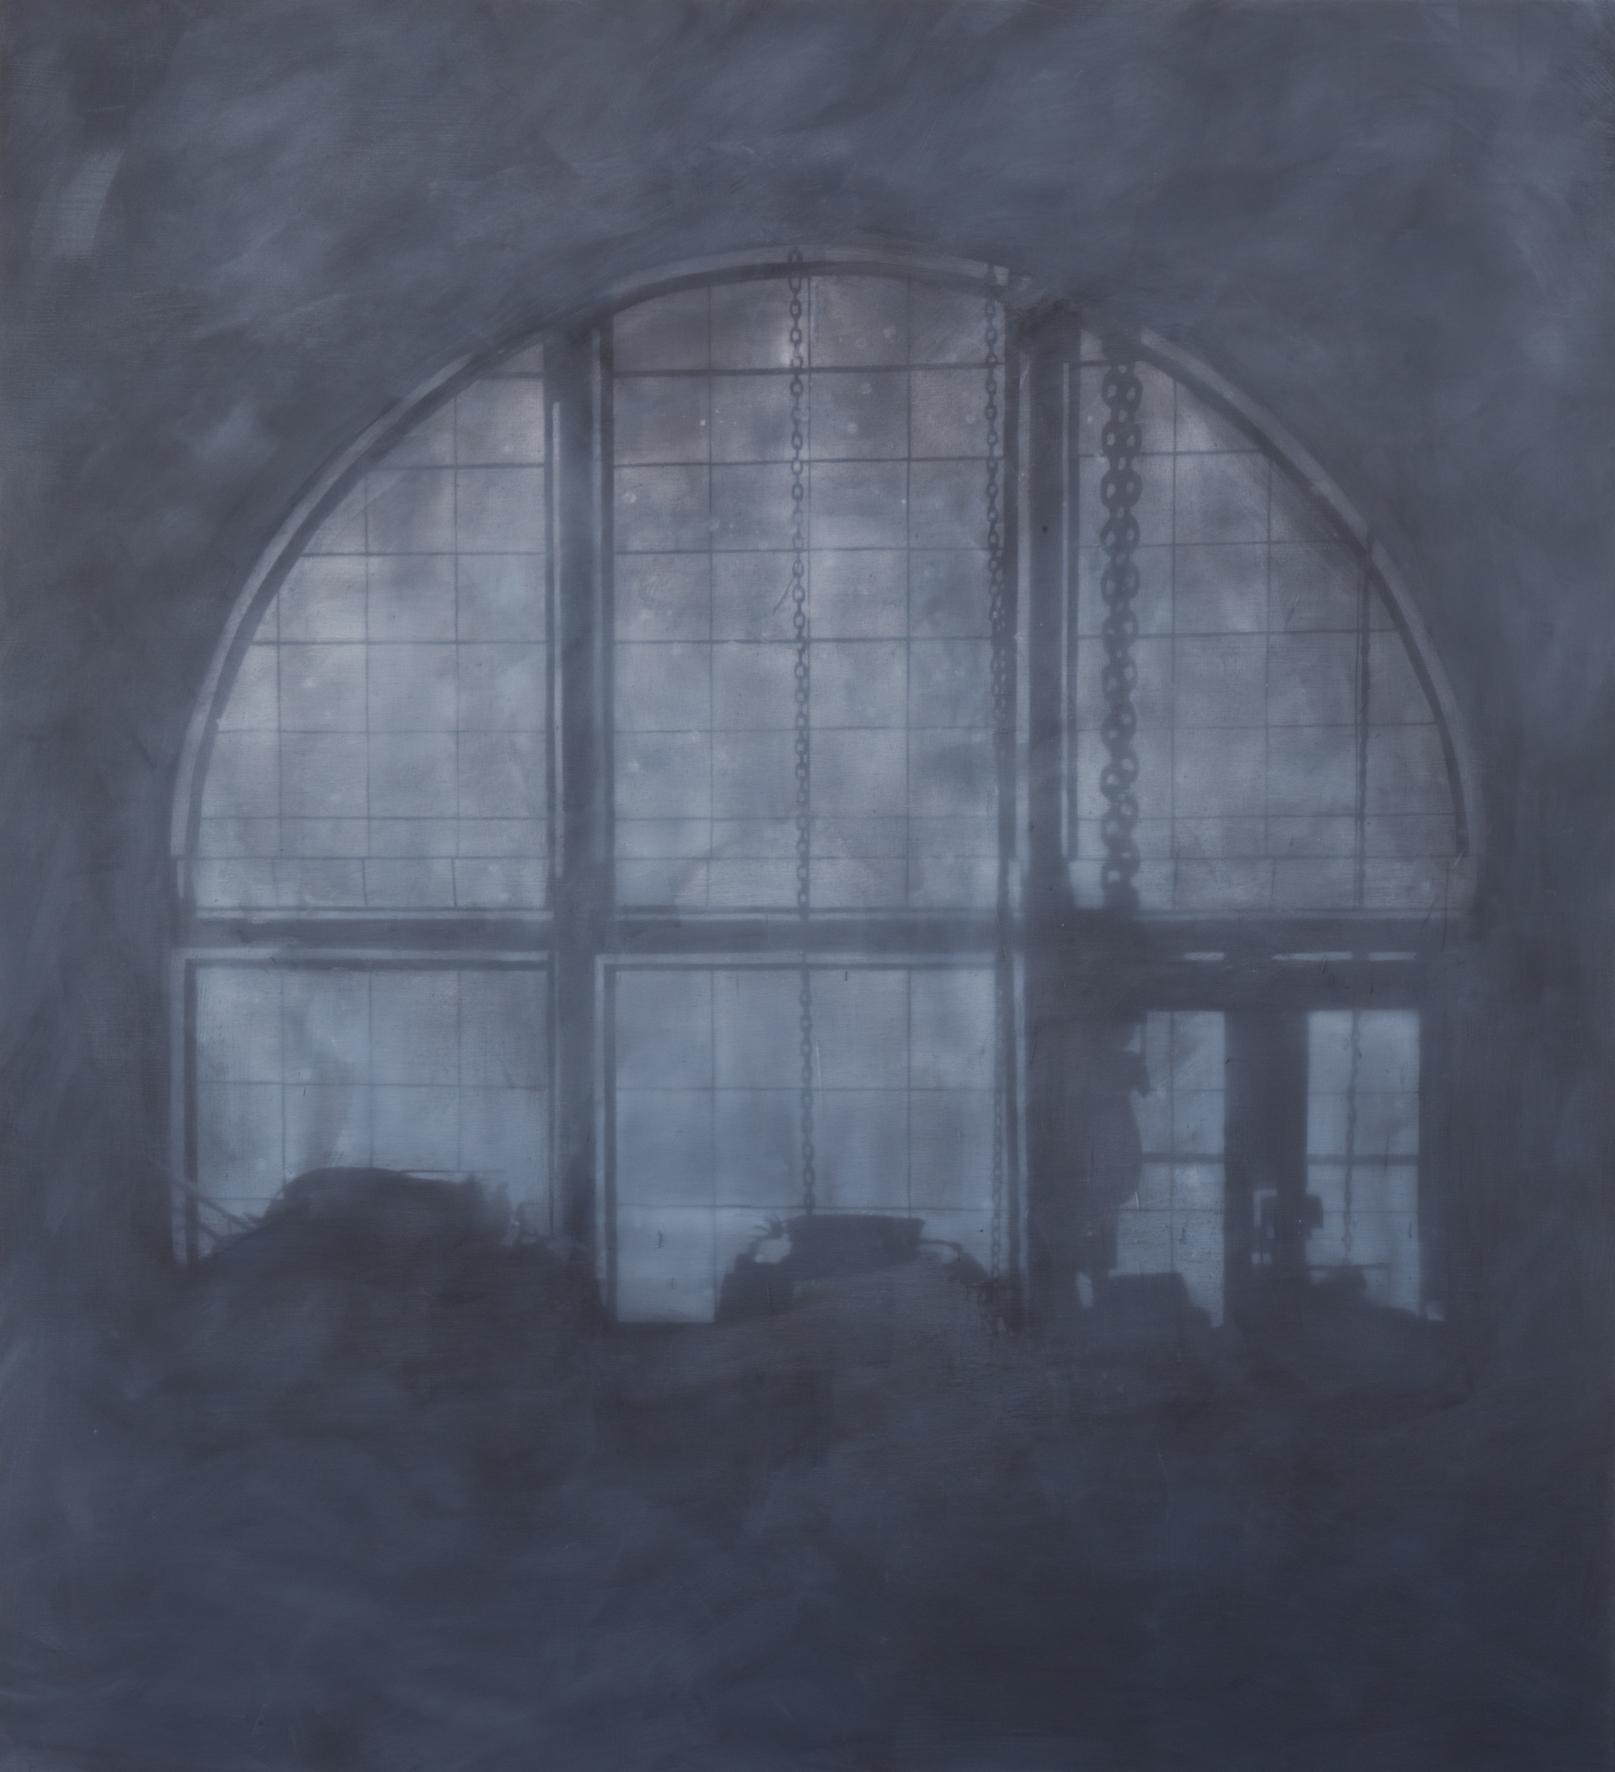 Looking towards the windows, 2014